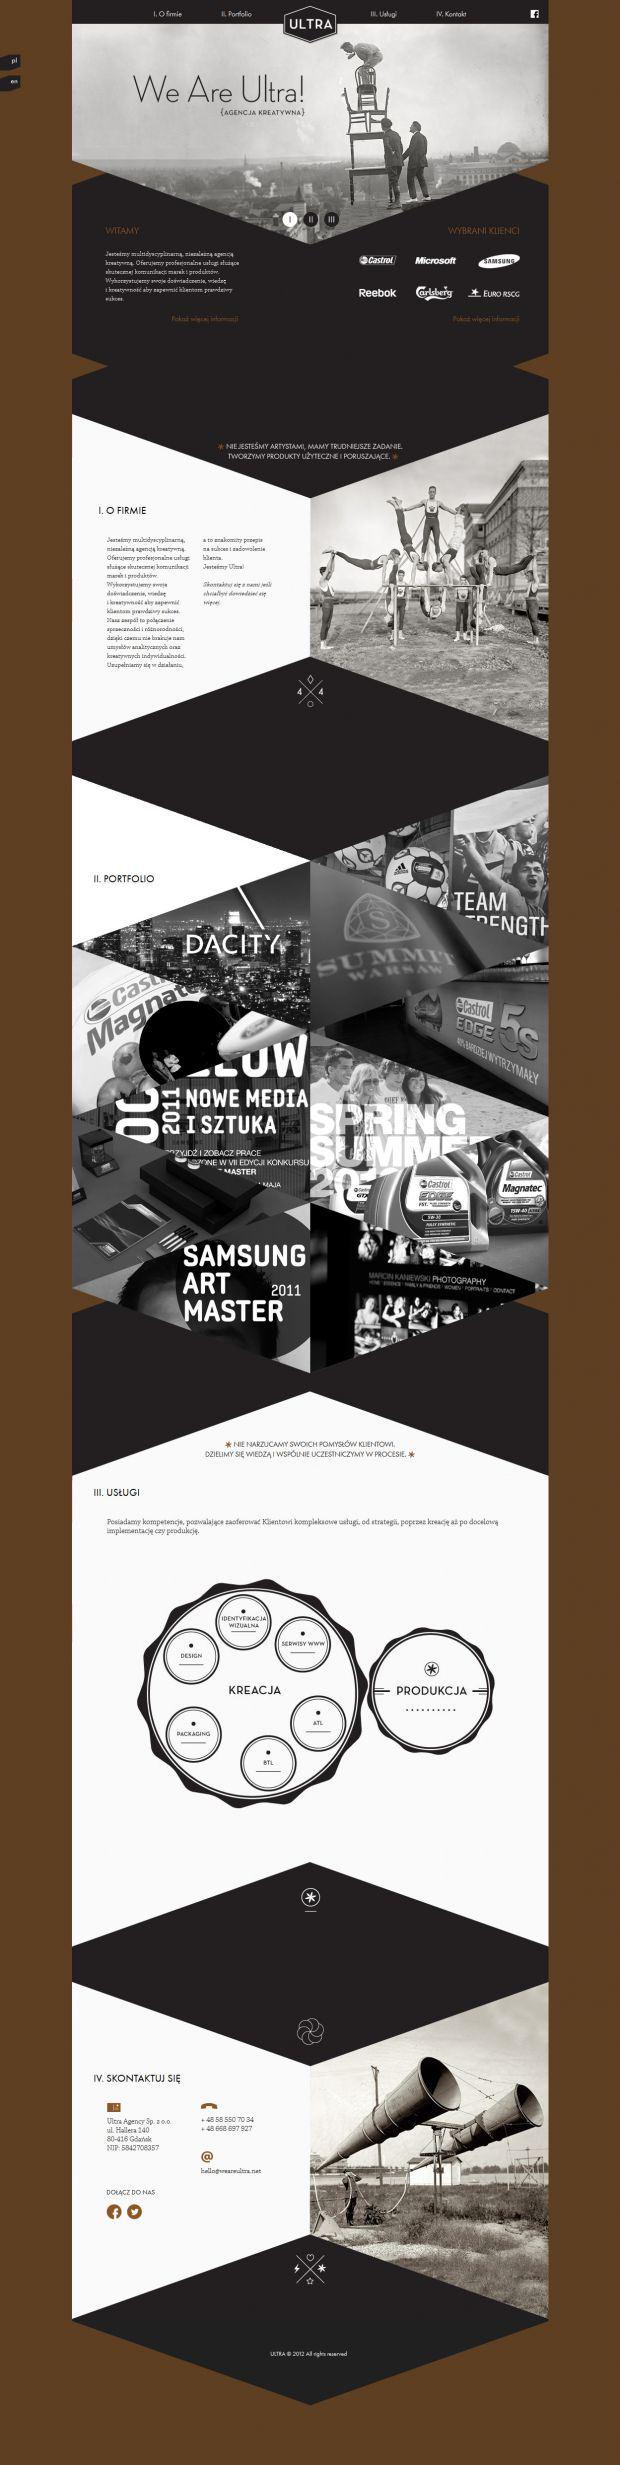 Ultra – We Are Ultra – Creative Agency – Webdesign inspiration www.niceoneilike.com